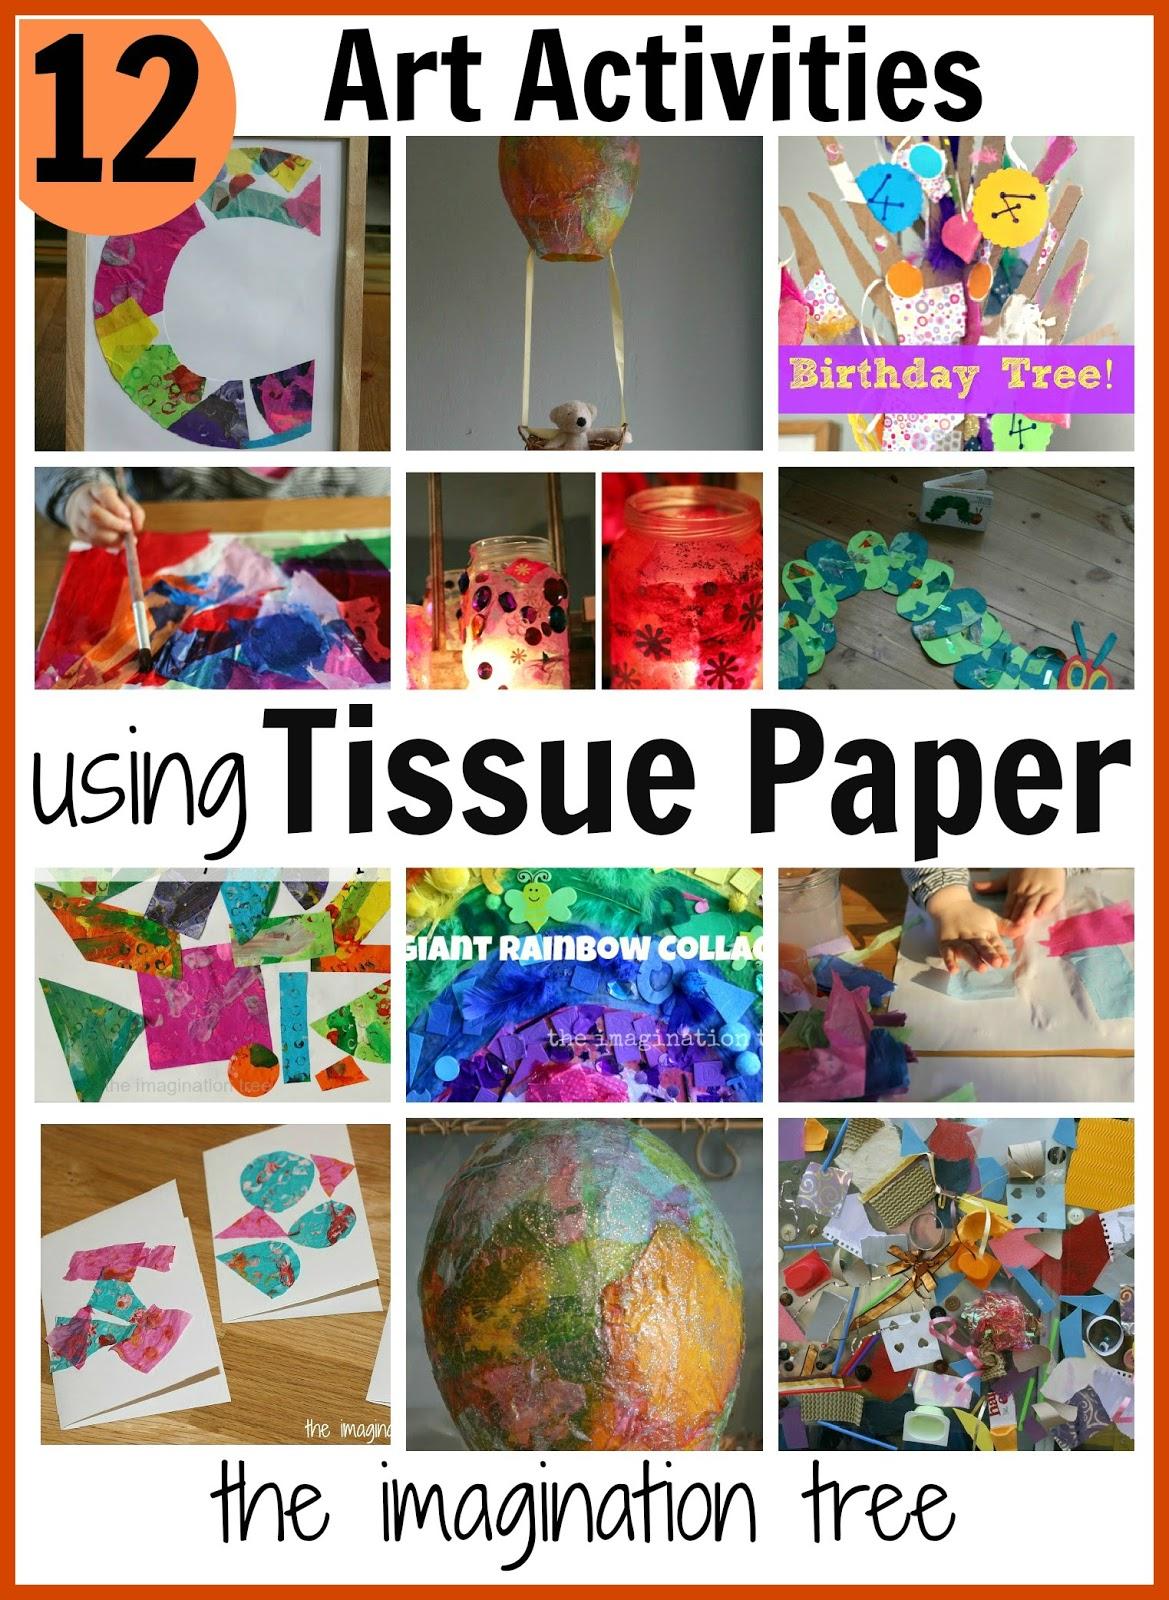 12 Art Activities Using Tissue Paper